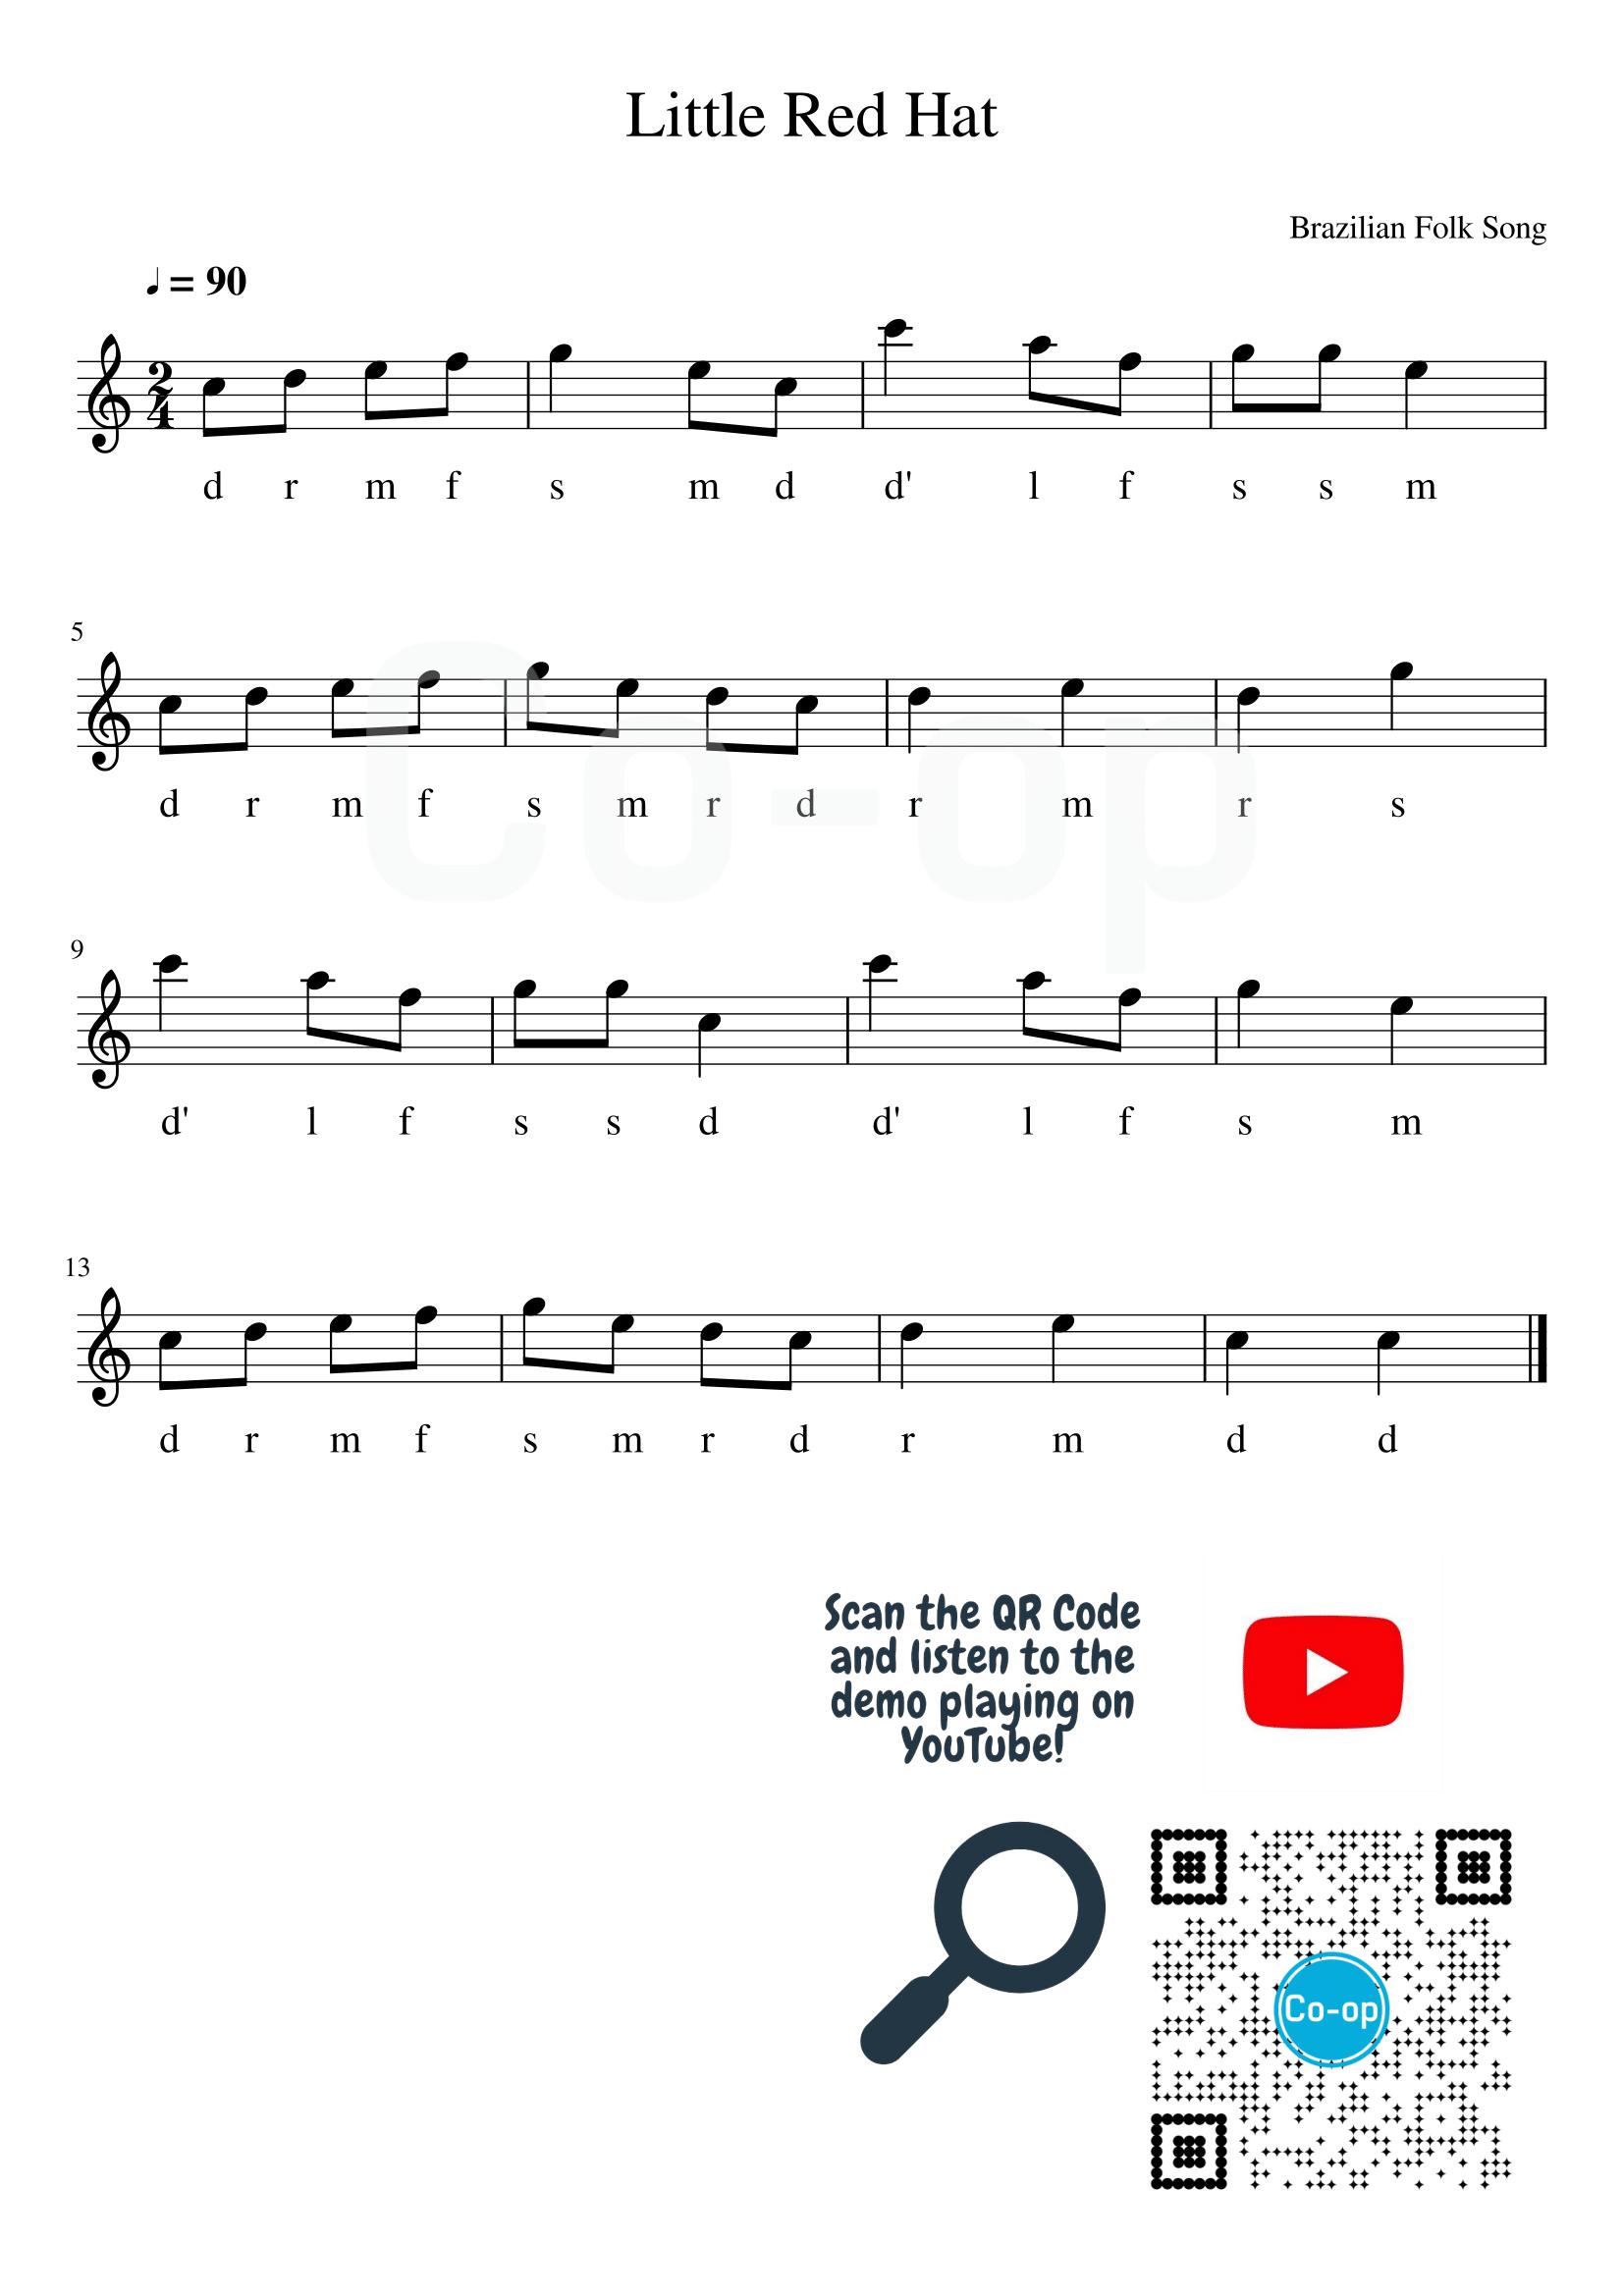 Little Red Hat | 五線譜連唱名 | Co-op 口琴學堂